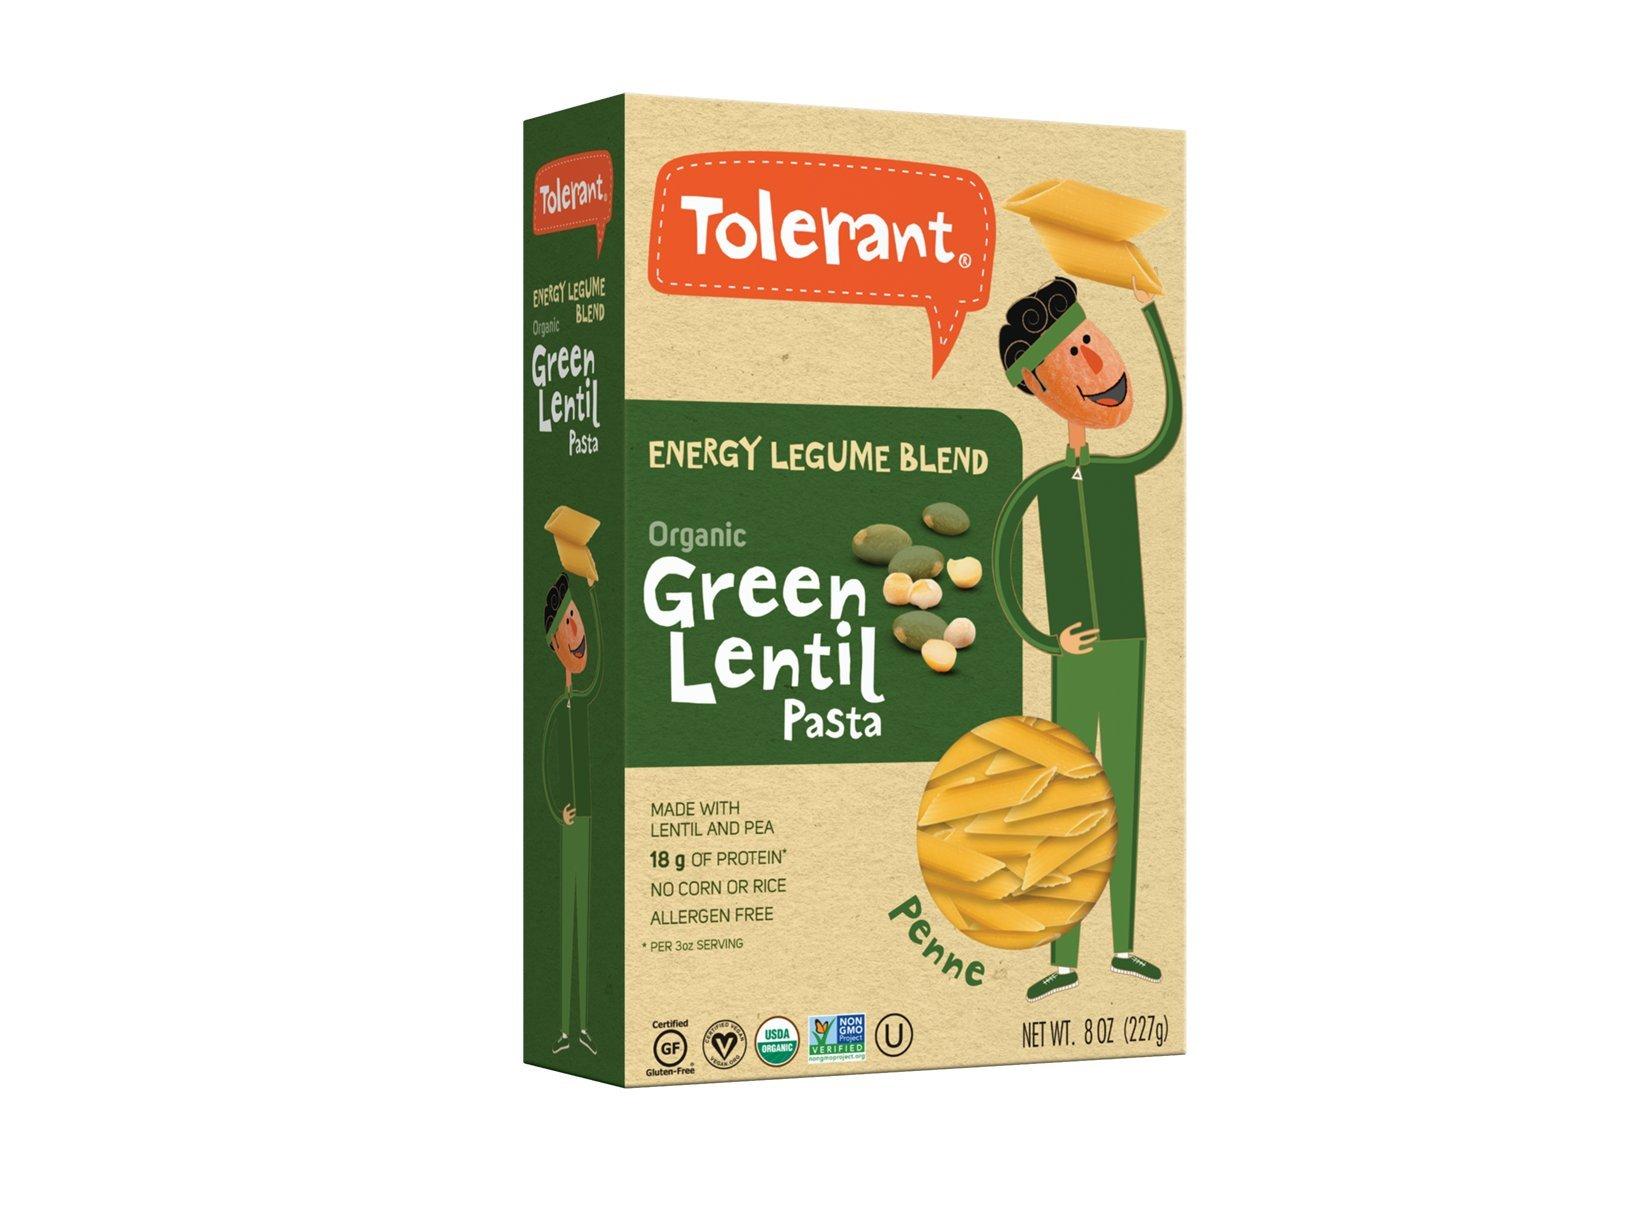 Tolerant Pasta Pen Gr Lntl&Pea Org by Tolerant Foods